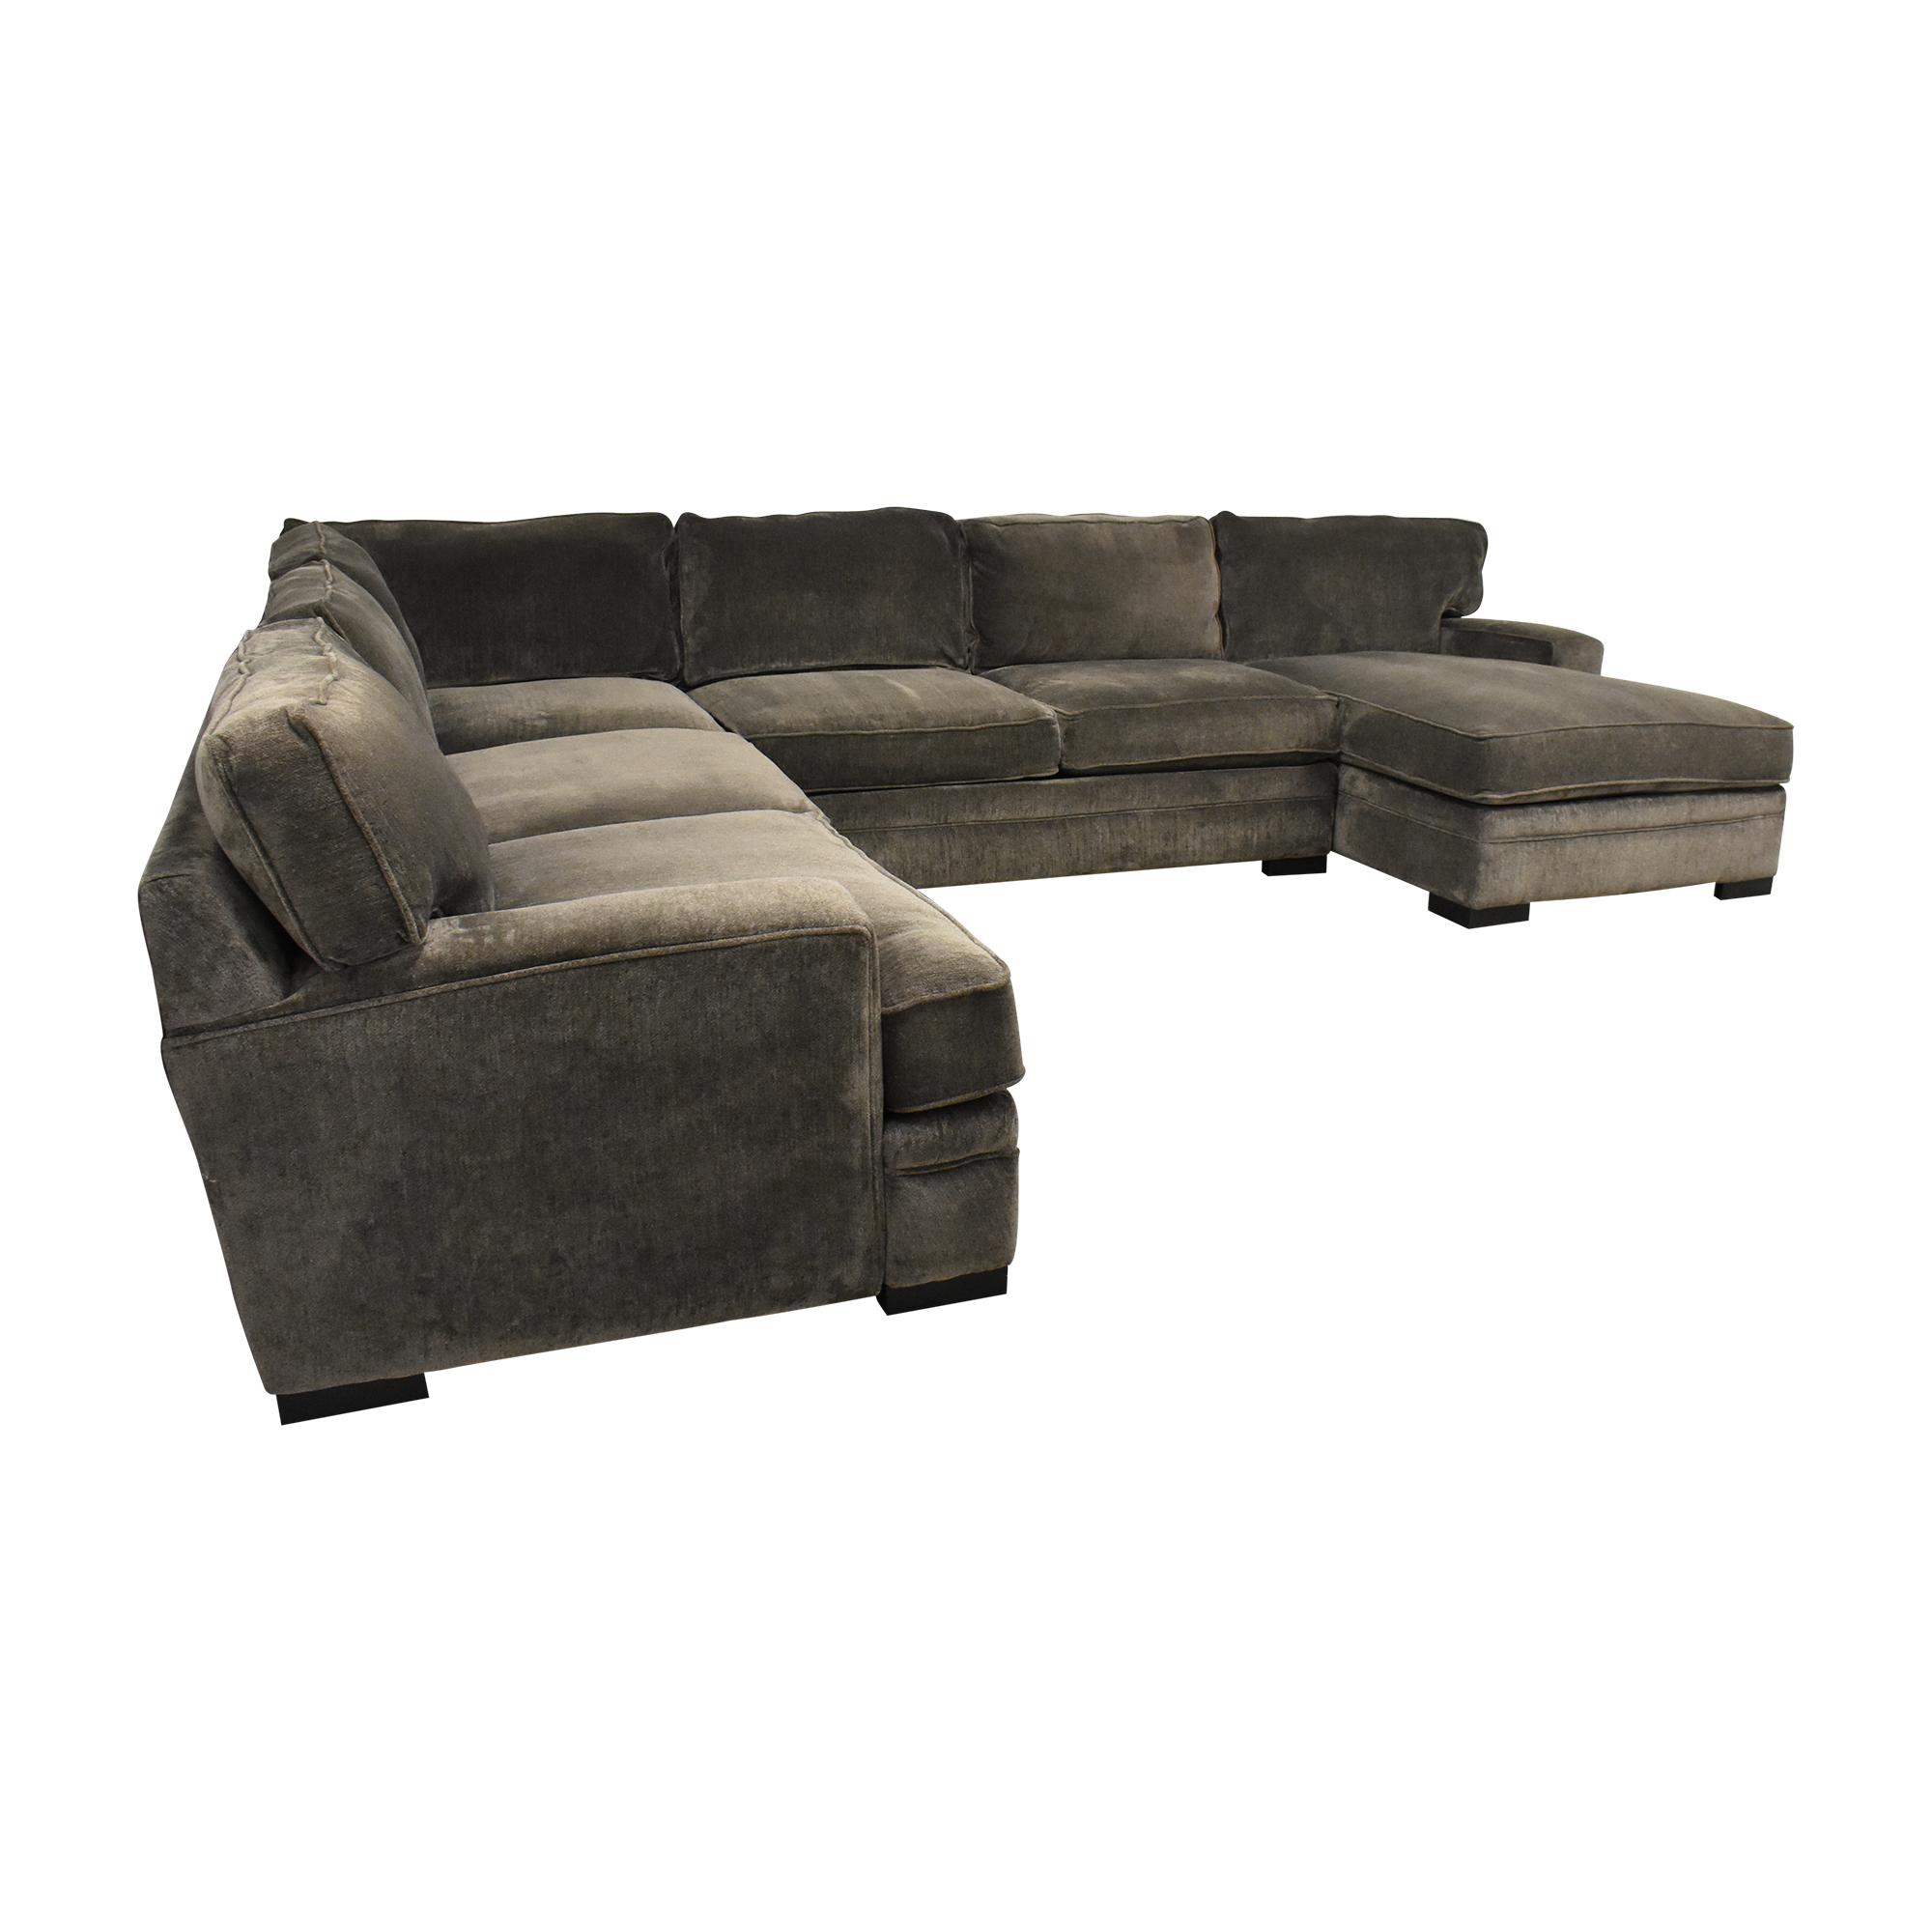 Macy's Macy's Corner Chaise Sectional Sofa dimensions